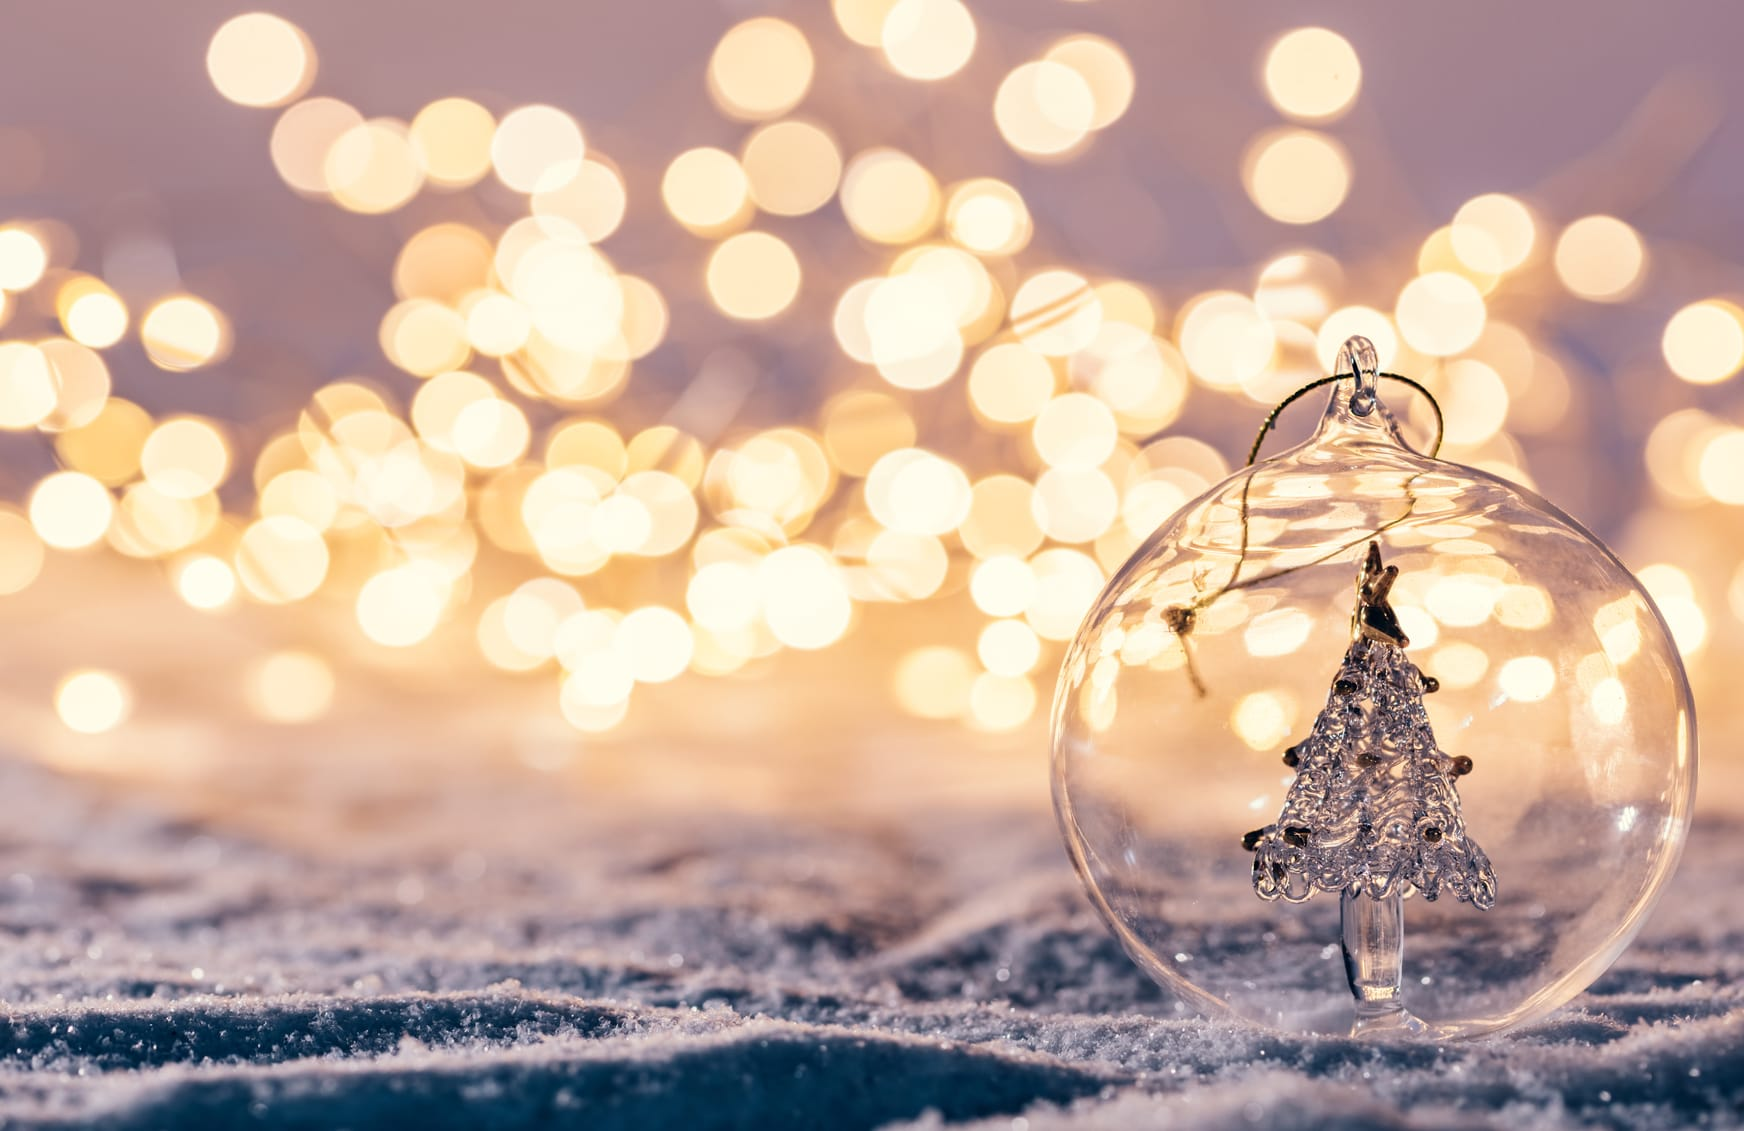 Outdoor Christmas Lights Festive Ideas For Your Garden